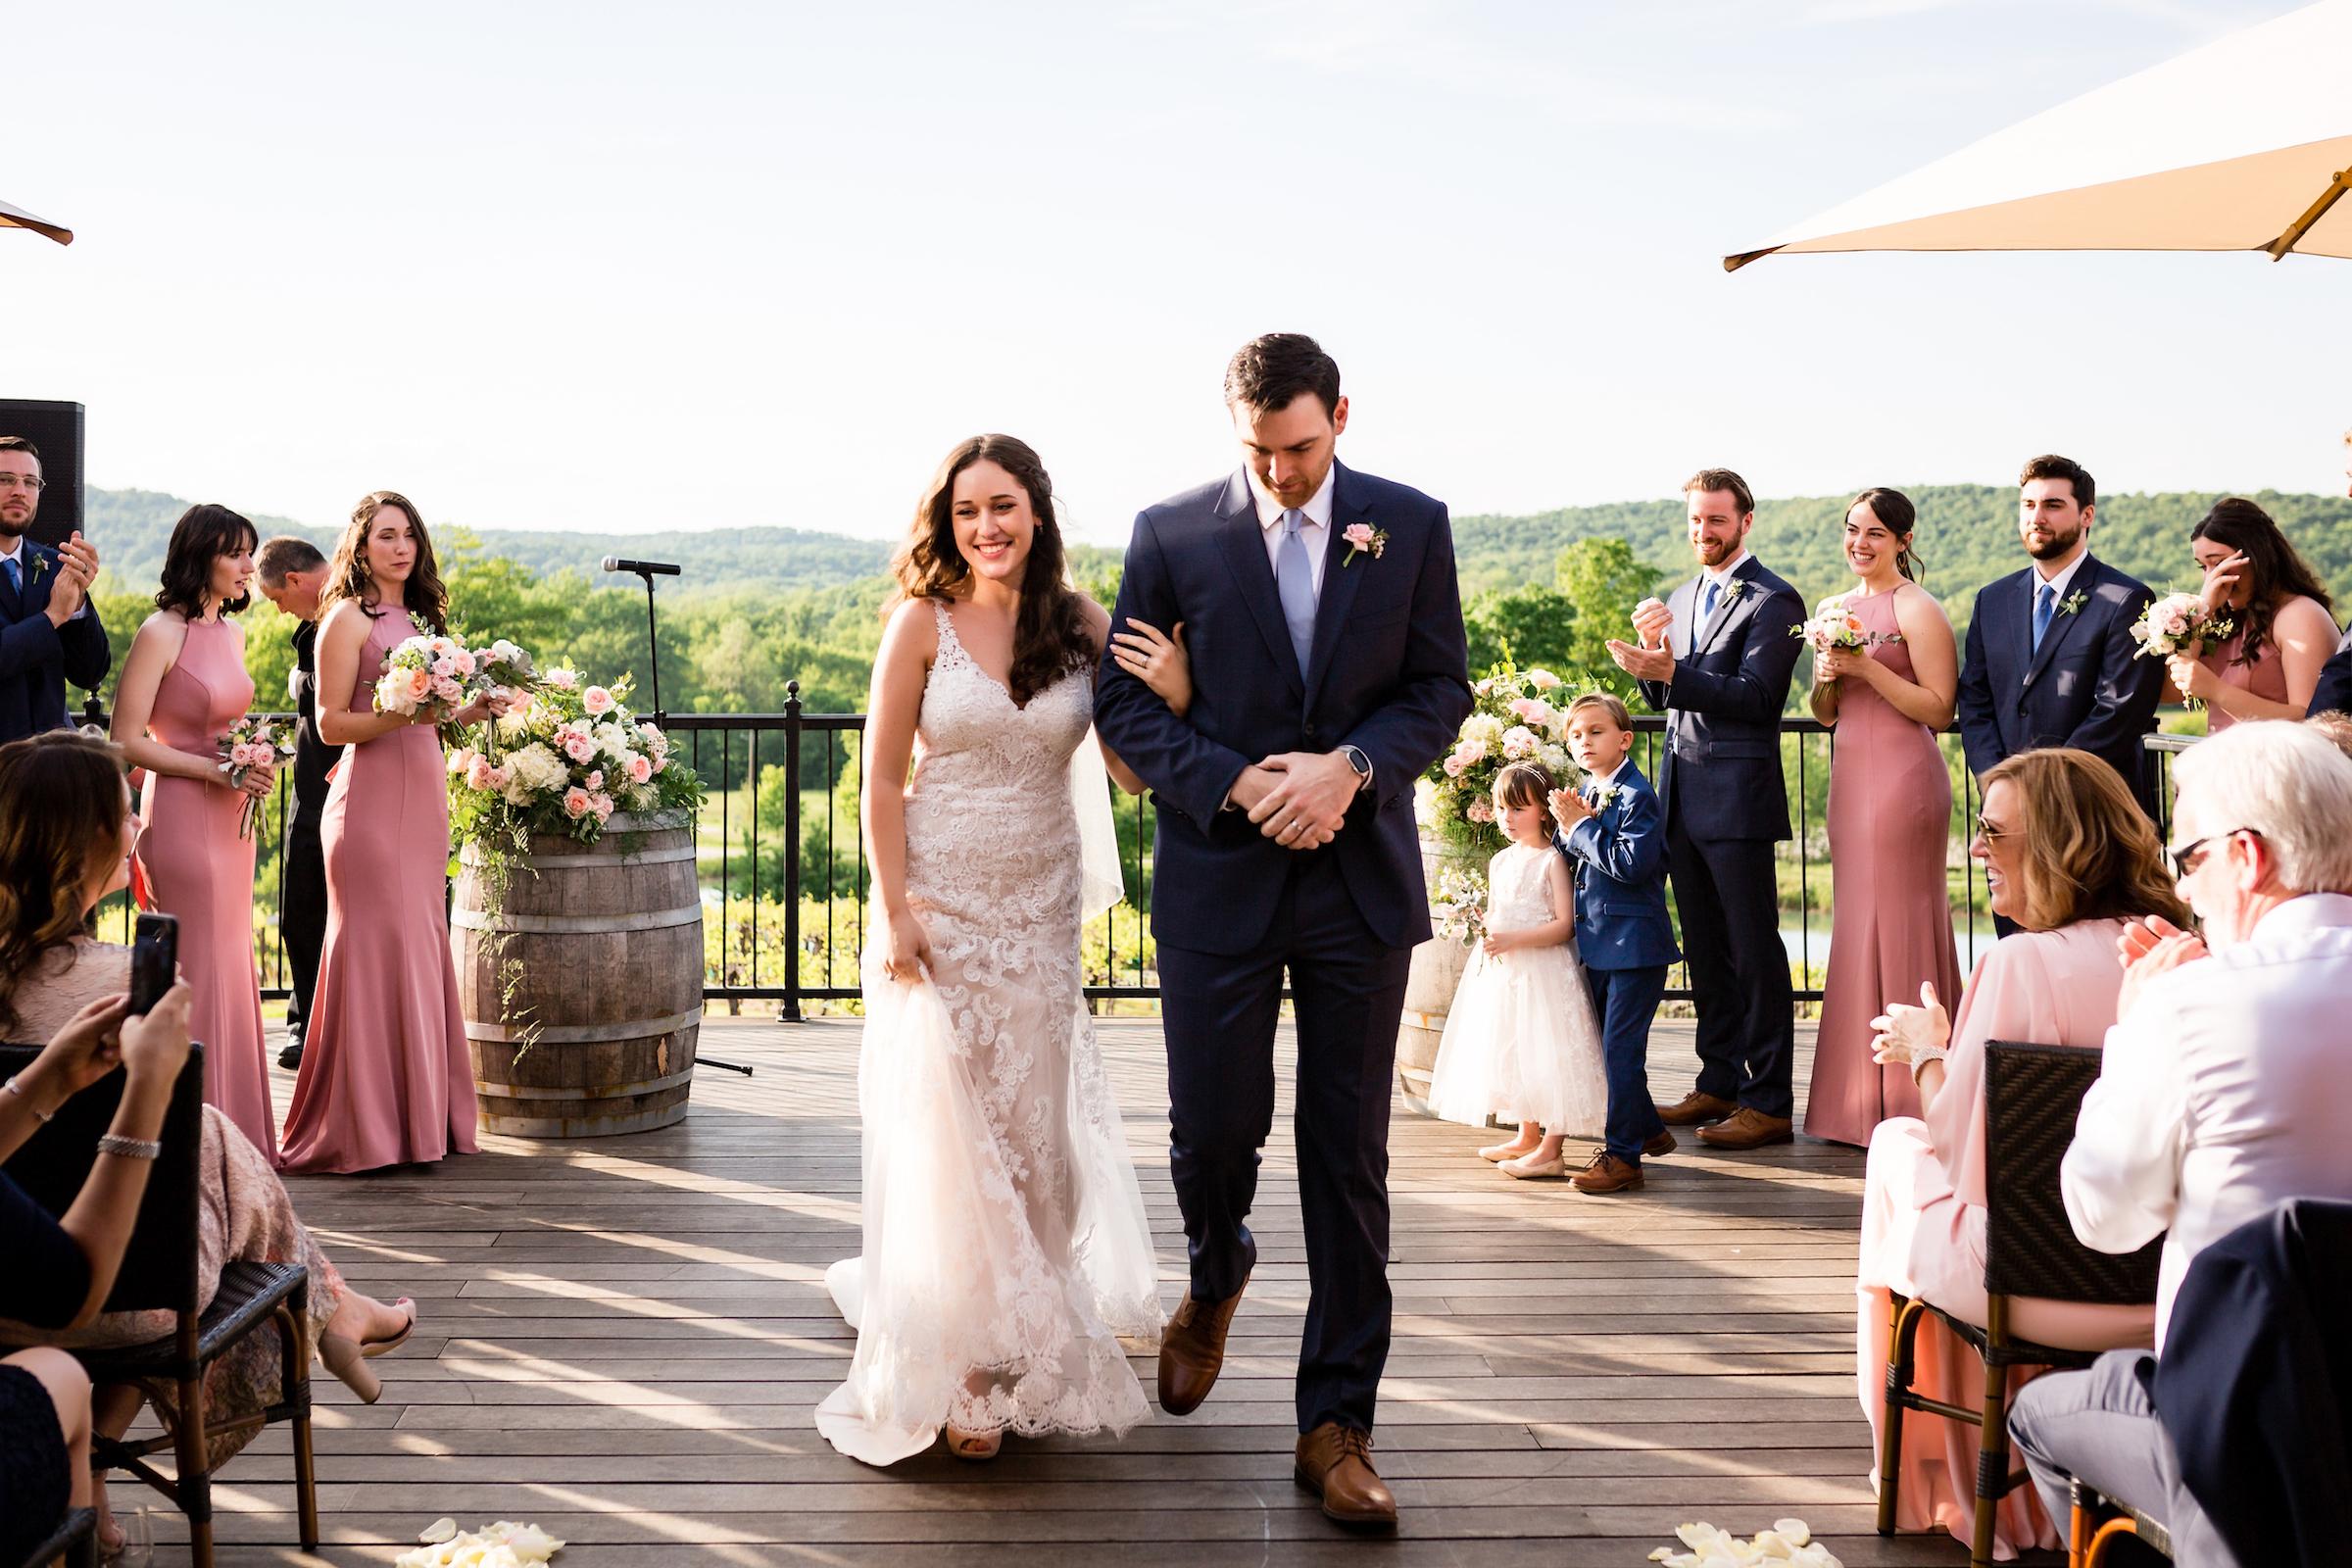 brielle-davis-events-kairos-photography-chandler-hill-wedding-ceremony-recessional.jpg